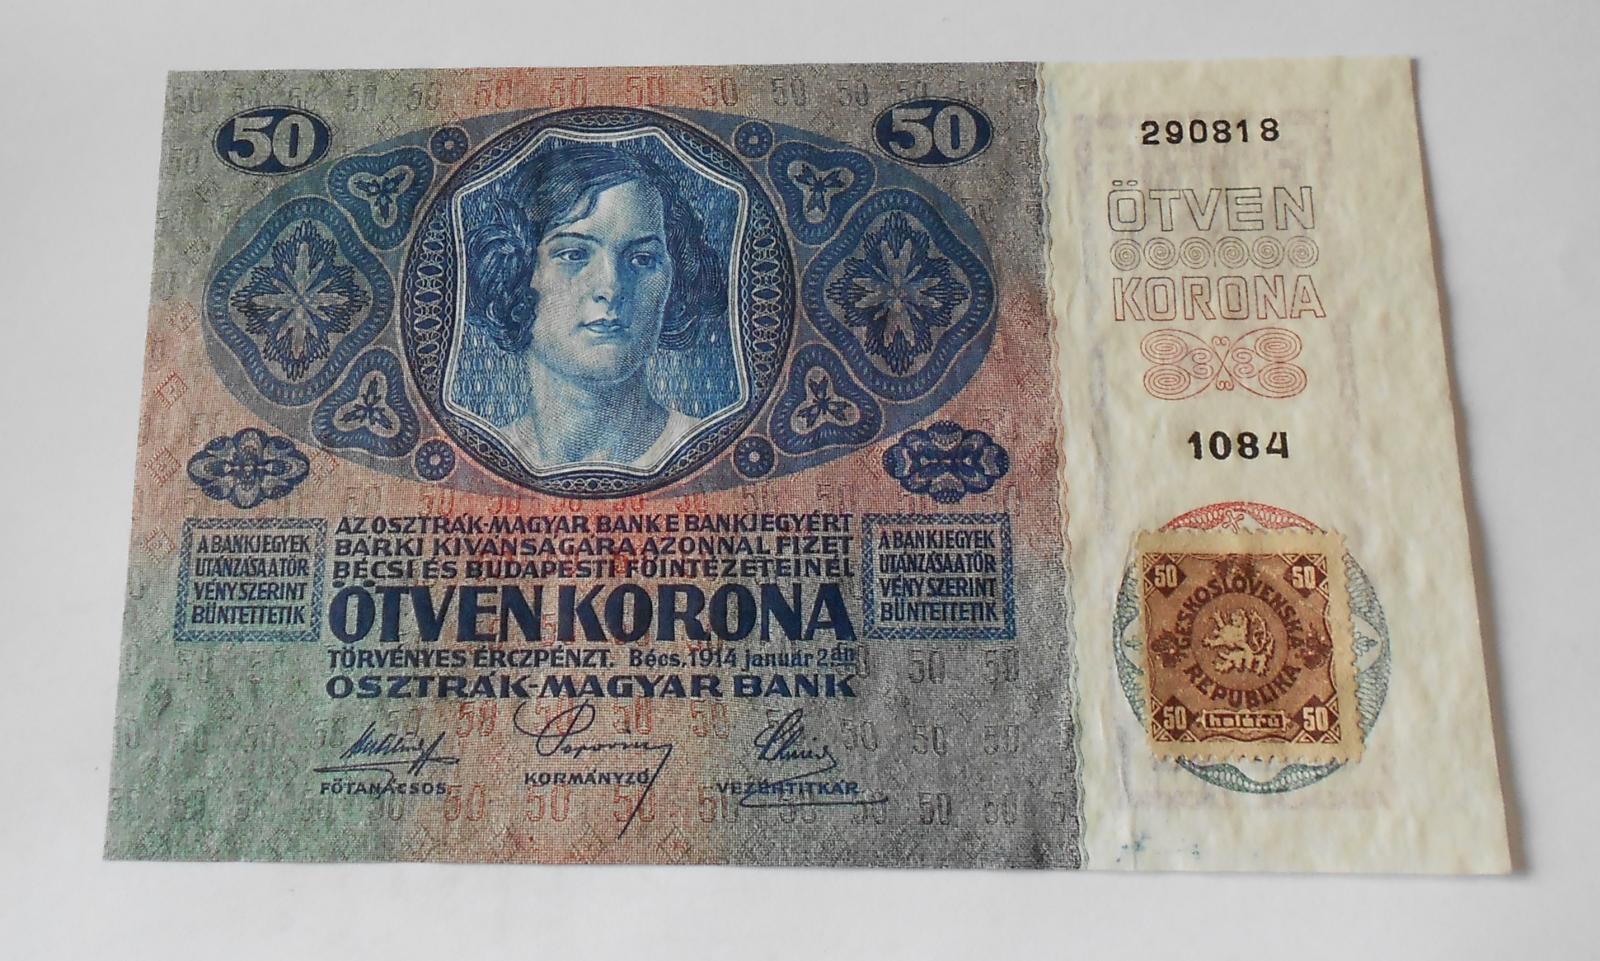 50Kč/1914-18-kolek ČSR/, stav 0, série 1084